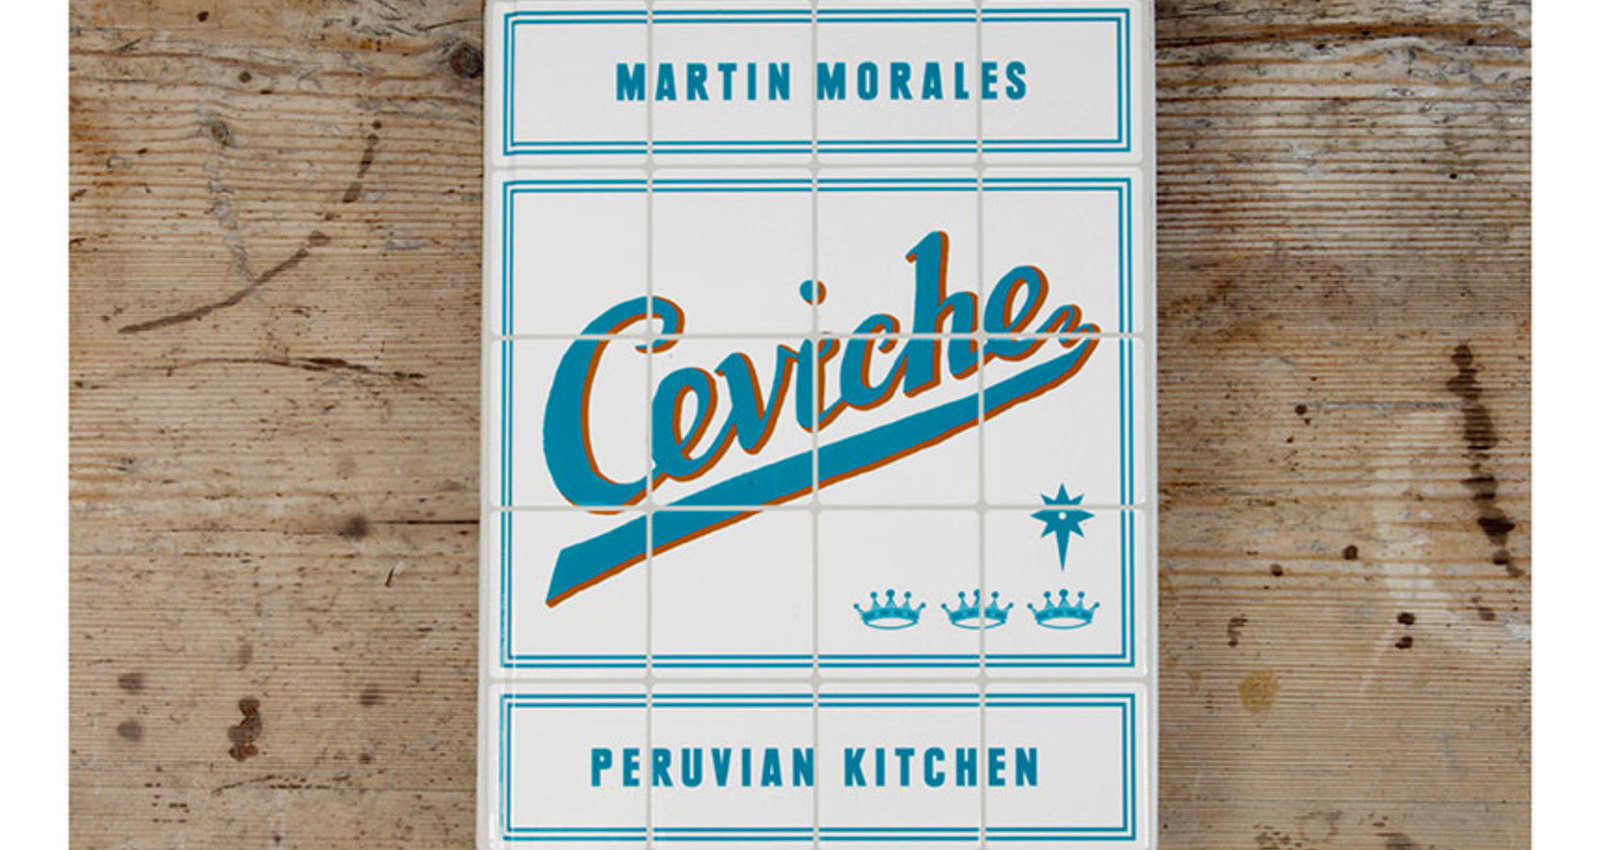 Ceviche - Peruvian Kitchen